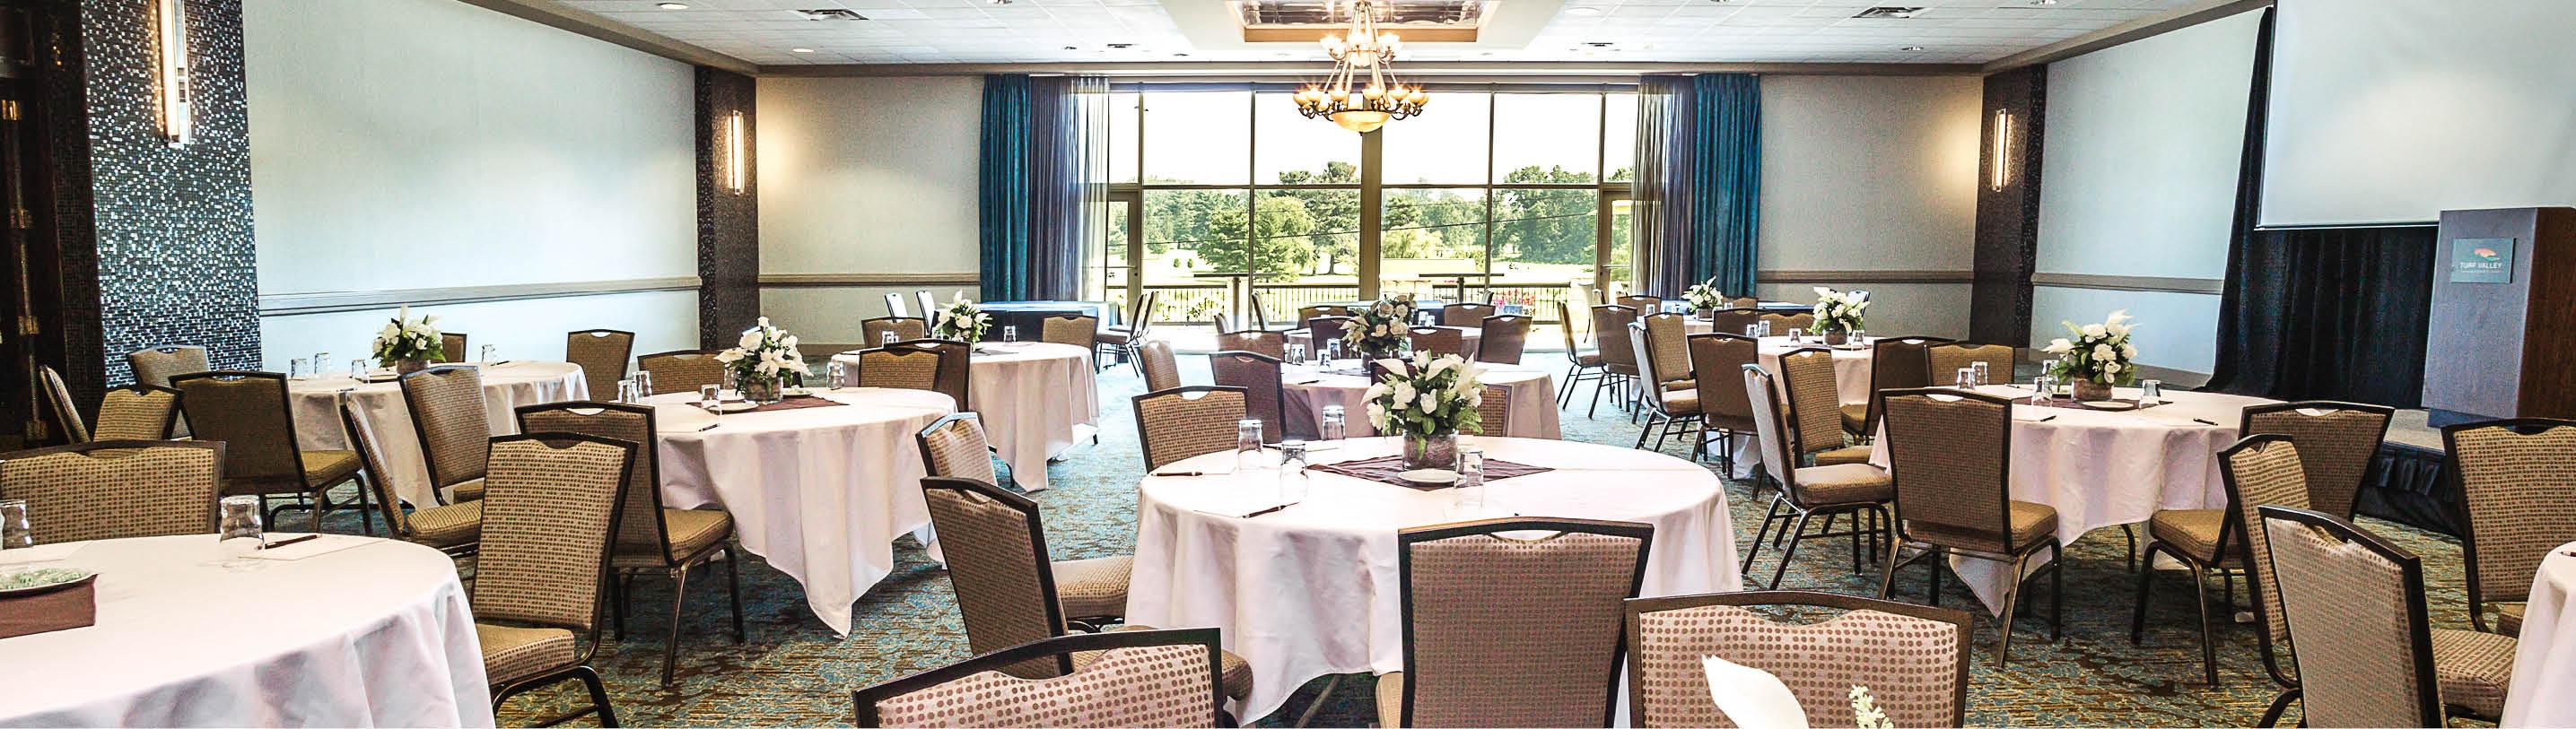 Turf Valley Resort Meeting Space at Maryland